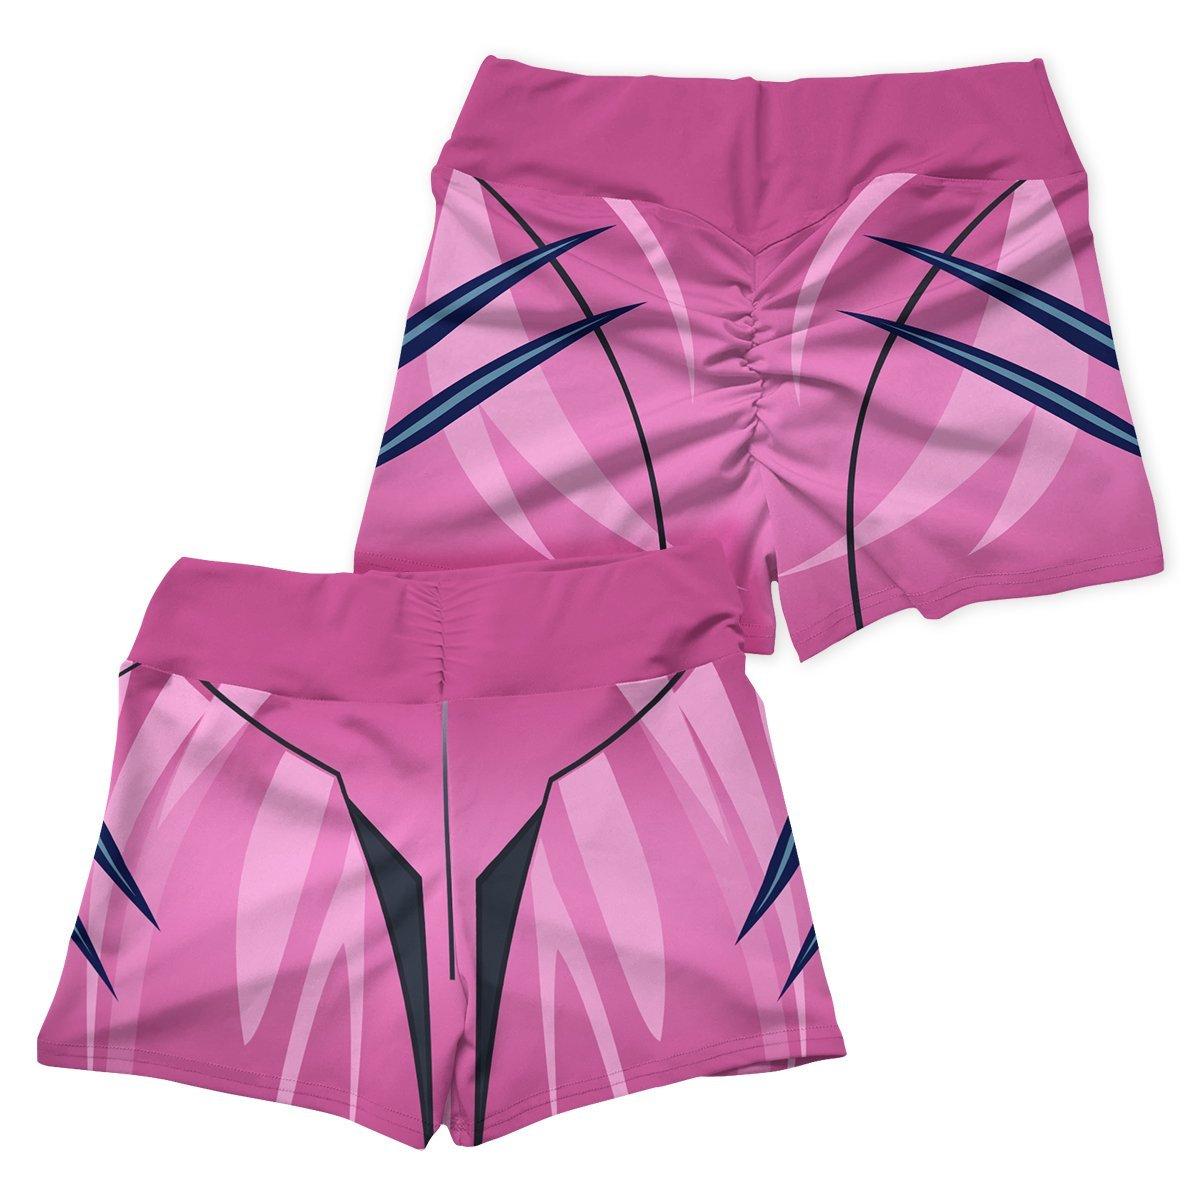 neon genesis mari active wear set 963118 - Anime Swimsuits